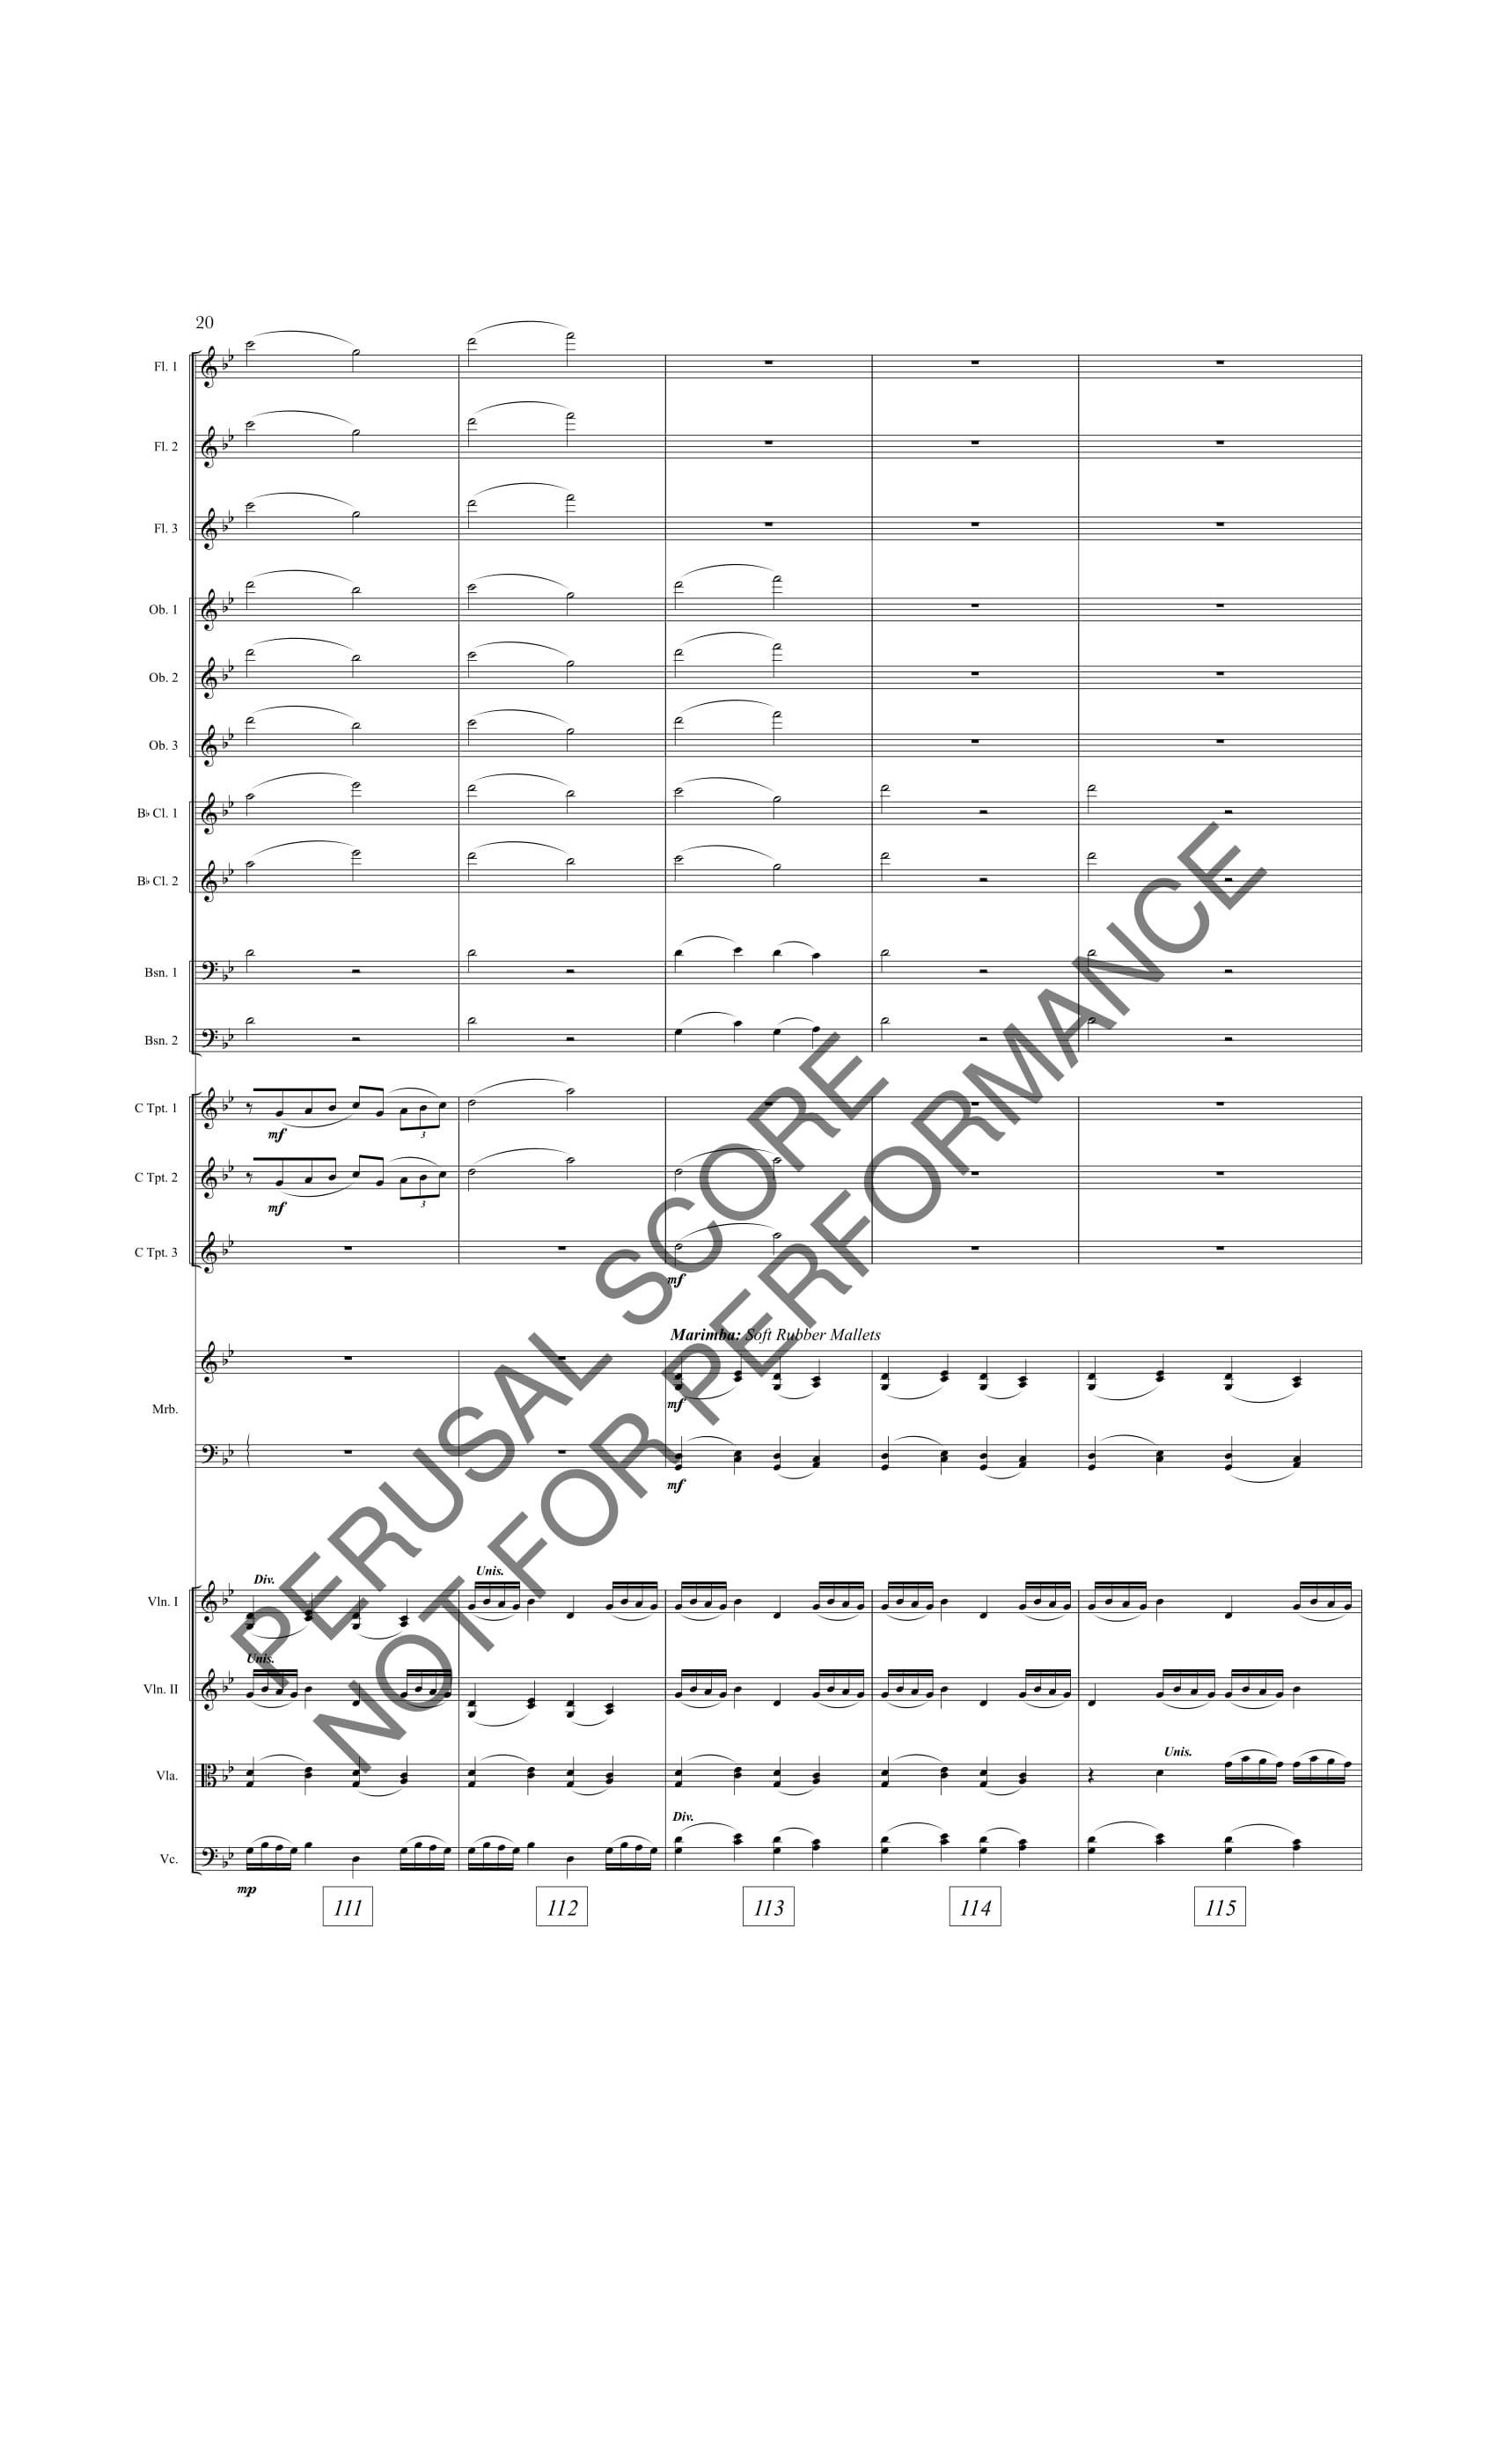 Boyd HouseofFountains Score-watermark-26.jpg